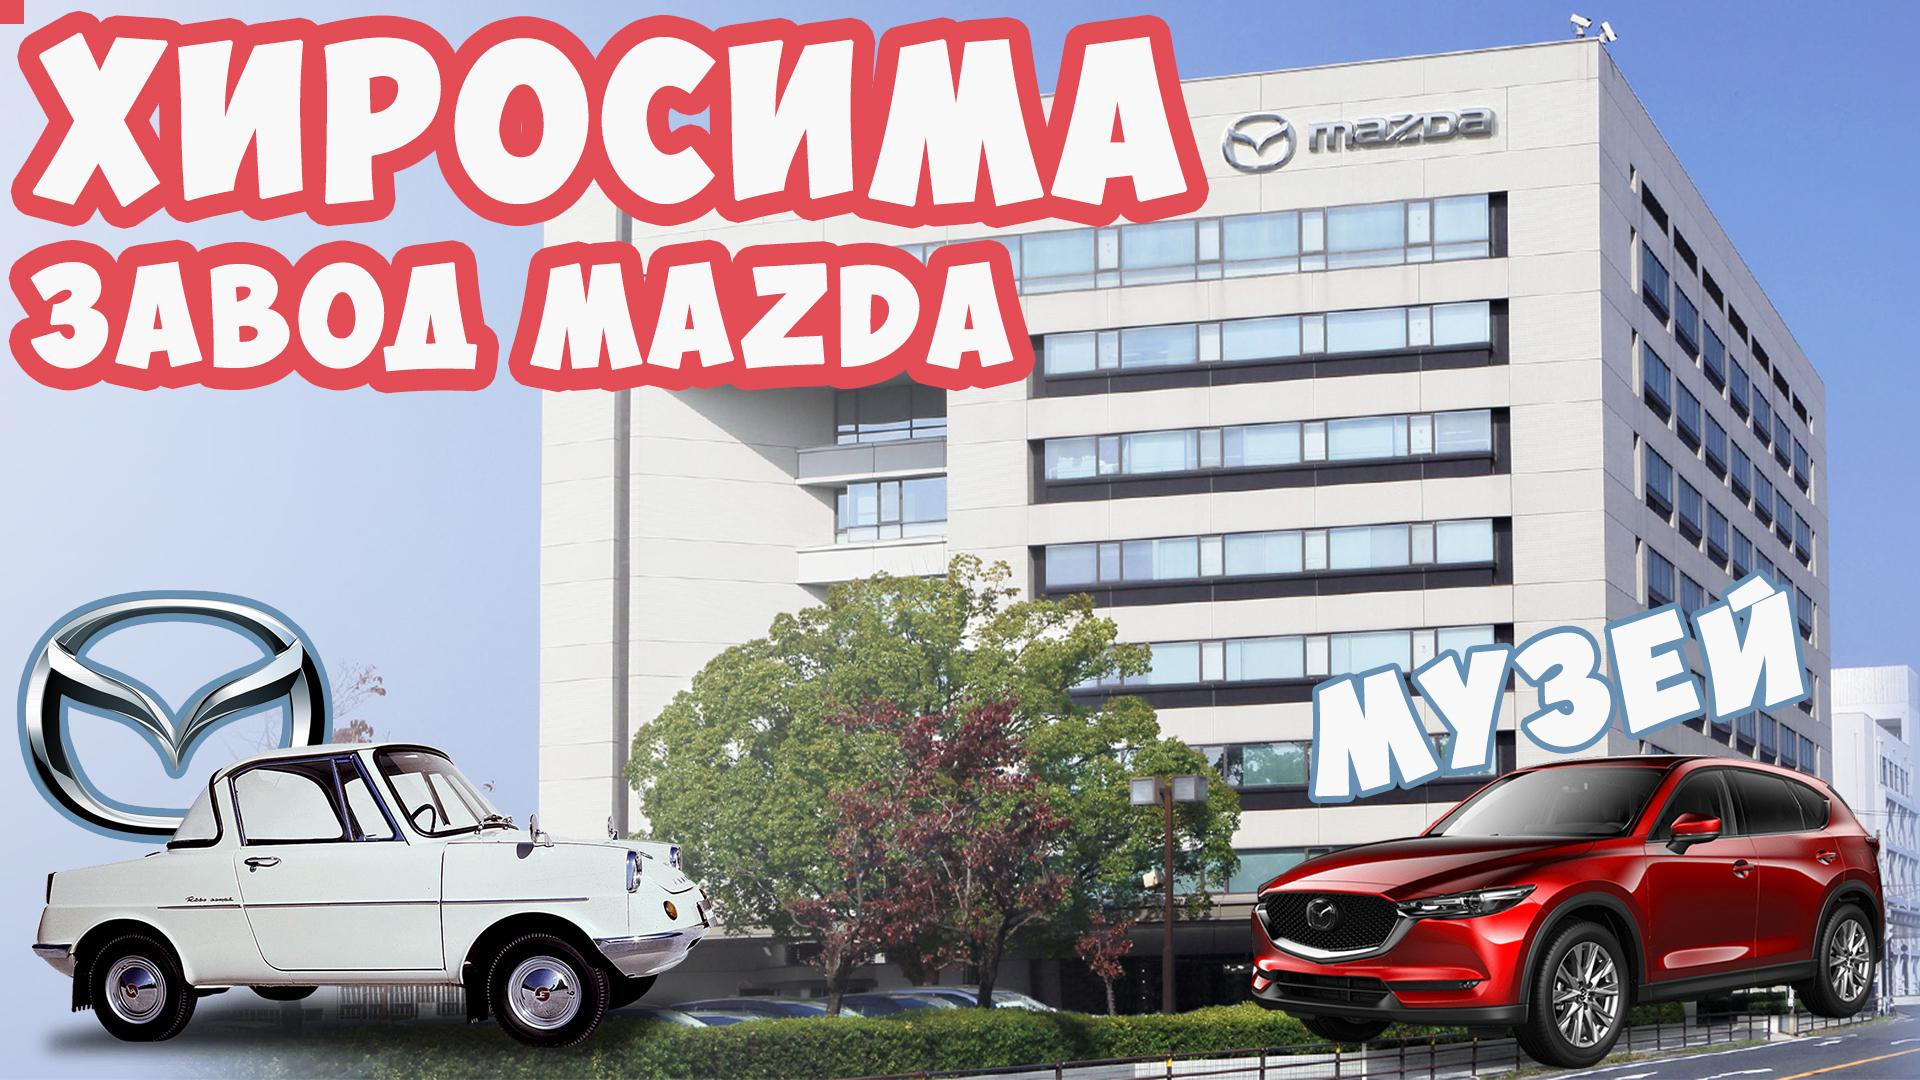 Хиросима: поездка на завод Mazda. Музей Mazda. Конвейер | Михаил Зейфман в Японии